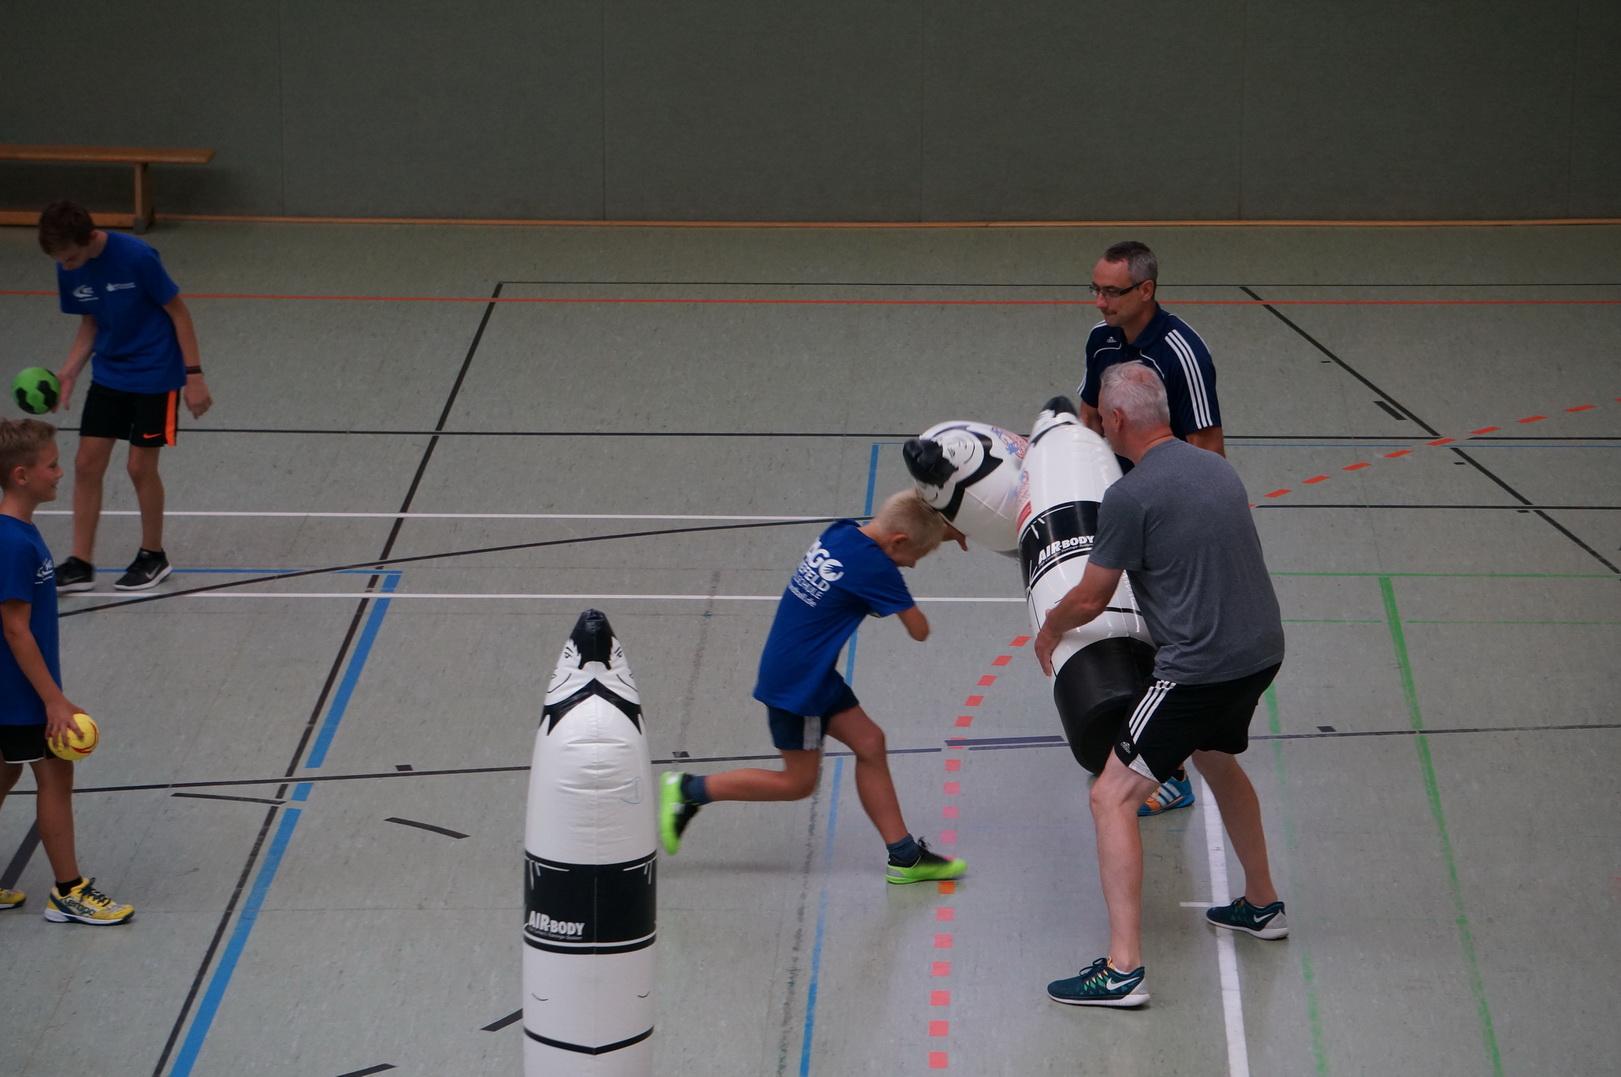 201808_Handballcamp_SDH_MG_256w